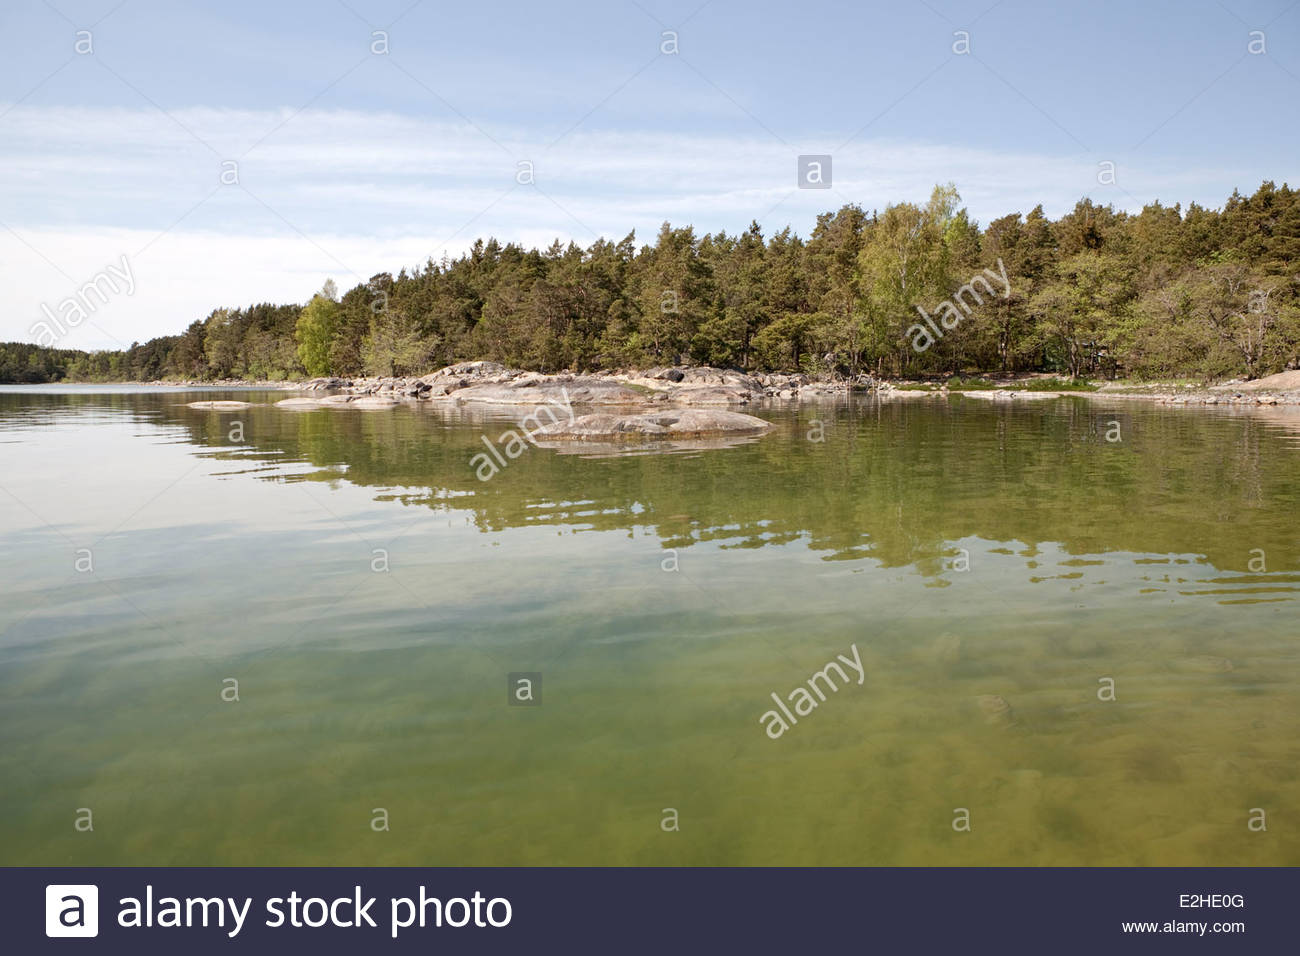 Calm sea in the spring - Stock Image